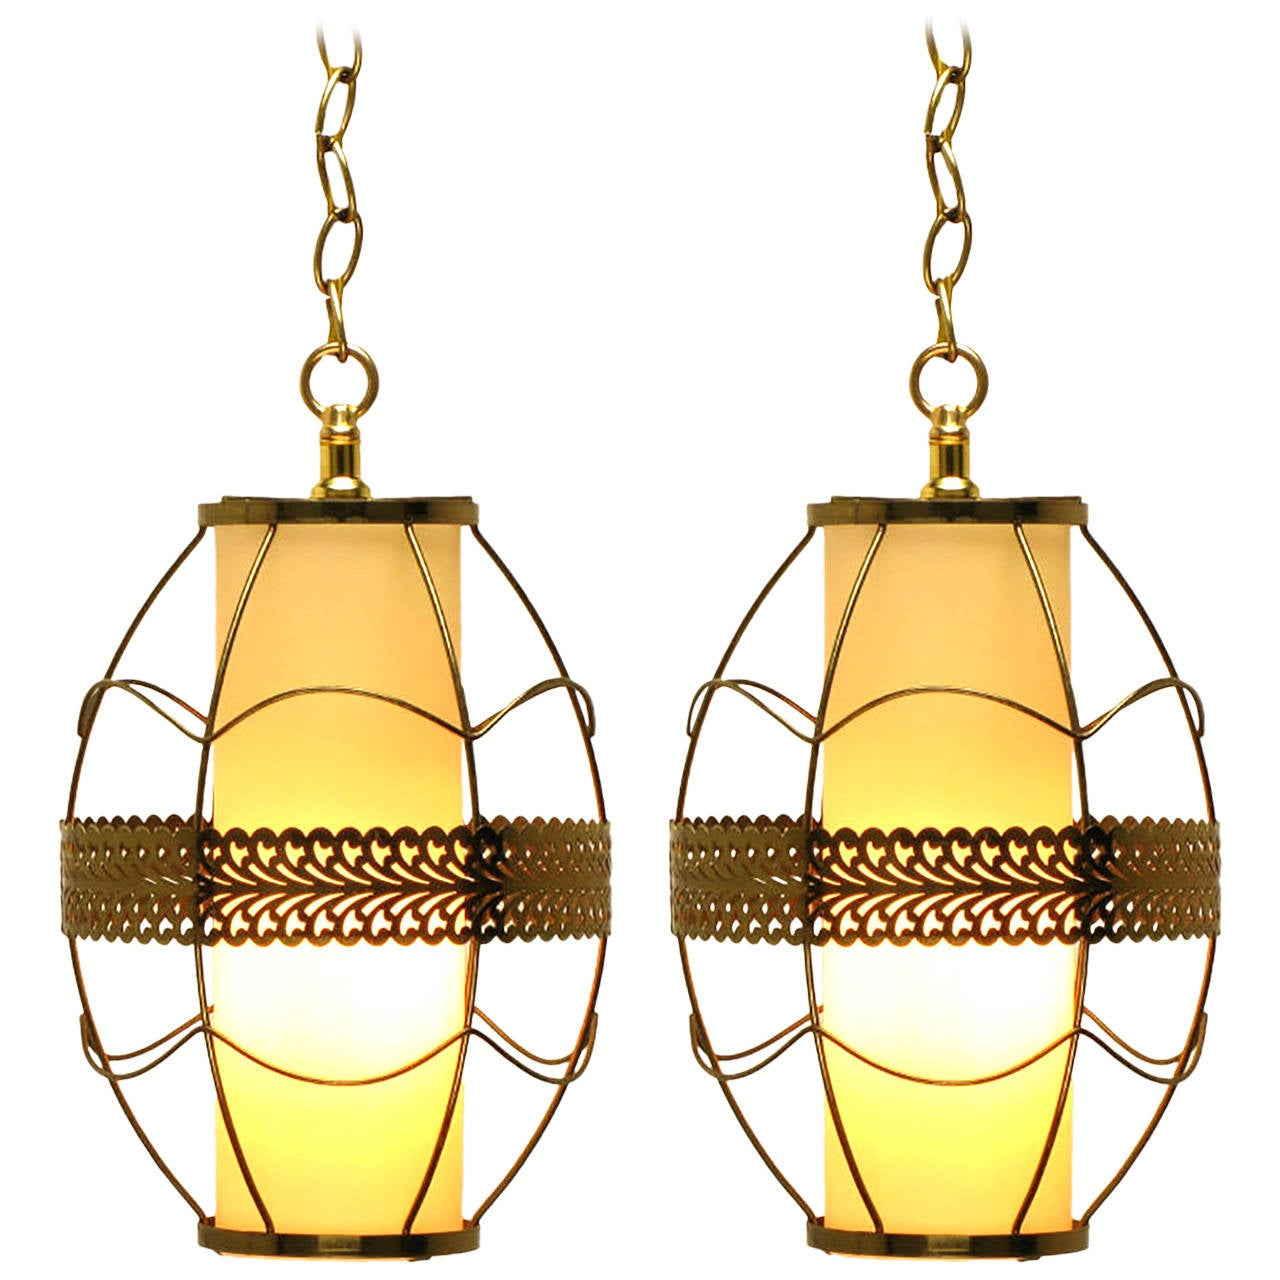 Pair of Brass Rod and Pierced Ribbon Pendant Lights